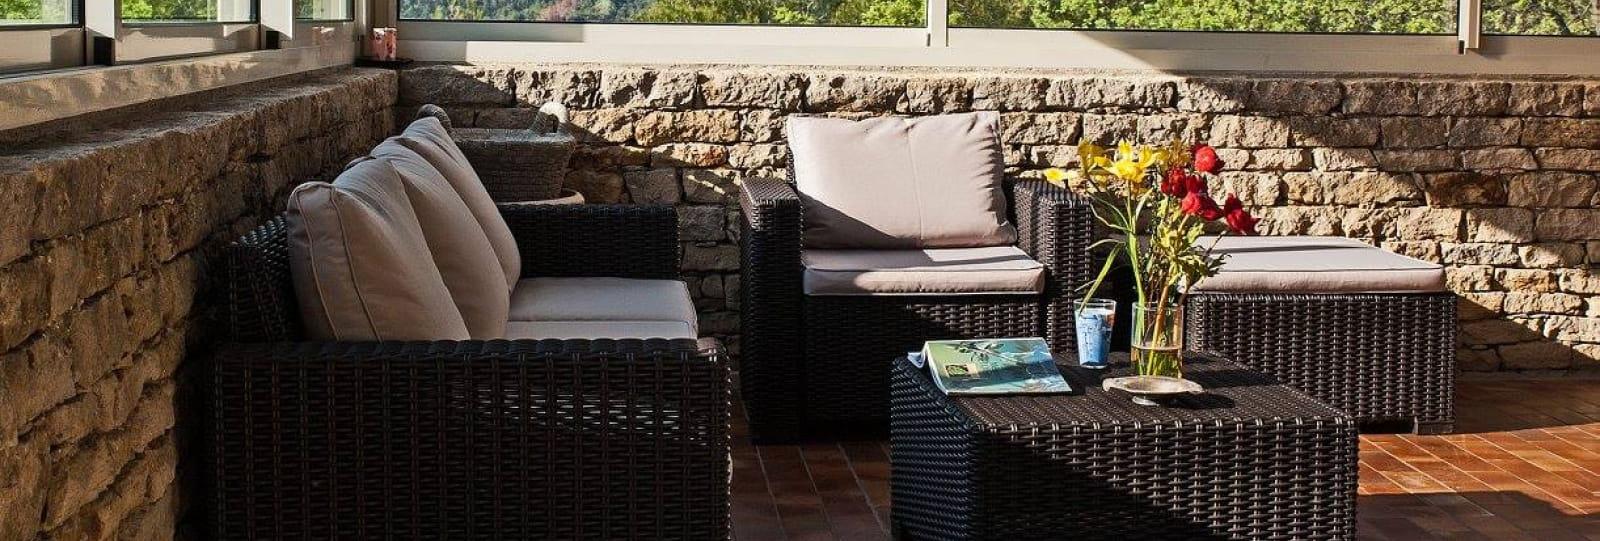 Salon terrasse